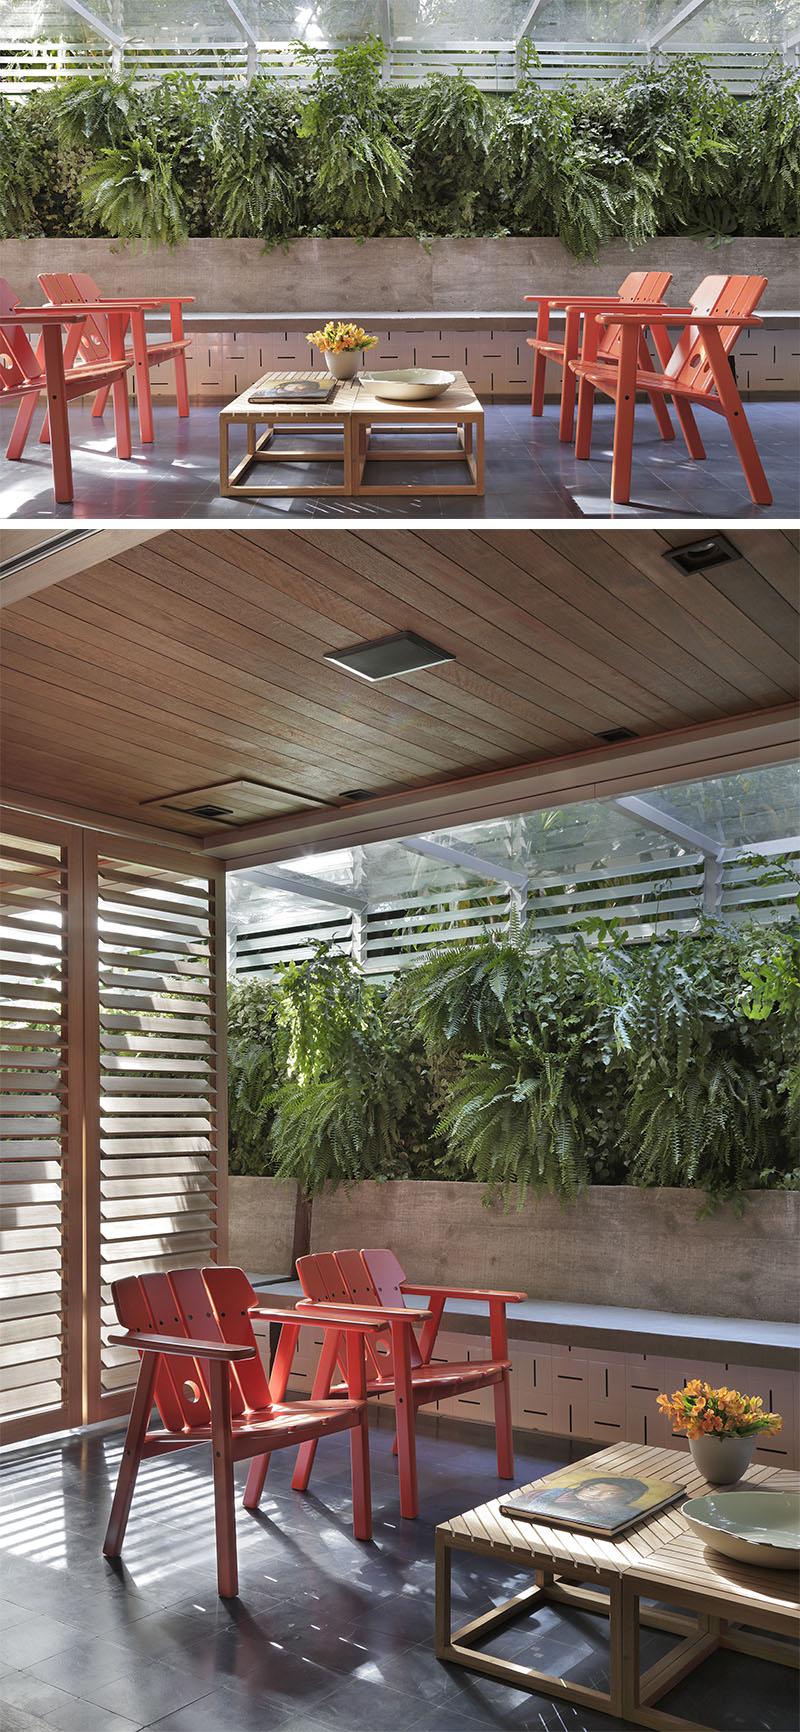 Apartment's Interior Design Featuring Wood Accents 1